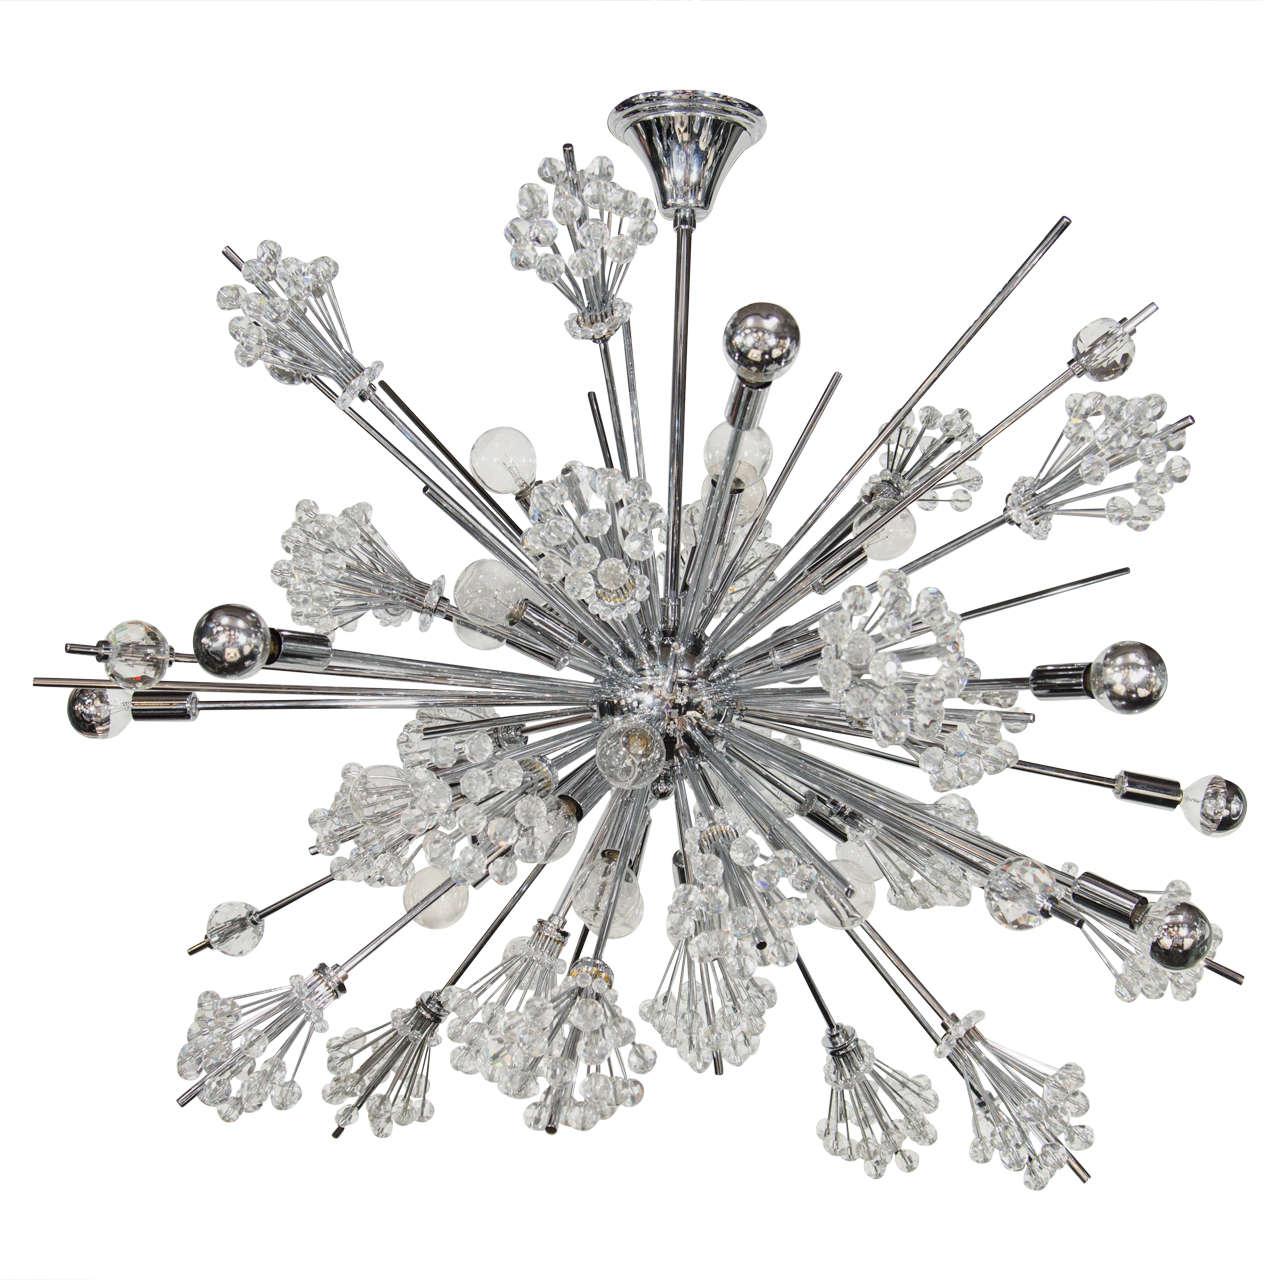 Exceptional Sputnik Chandelier By Lobmeyr Featuring Fine